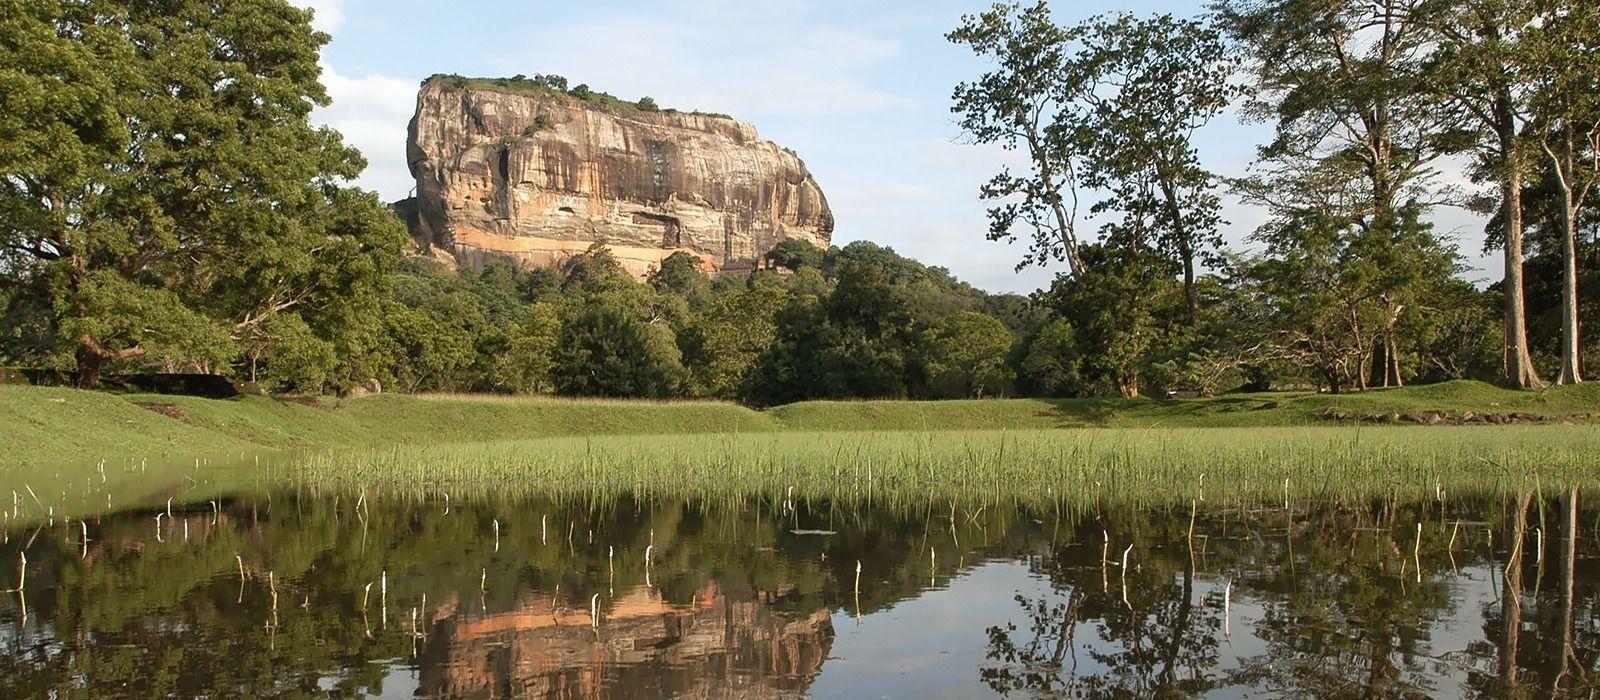 Reise nach Sri Lanka: Traumland & Ayurveda Paradies Urlaub 2